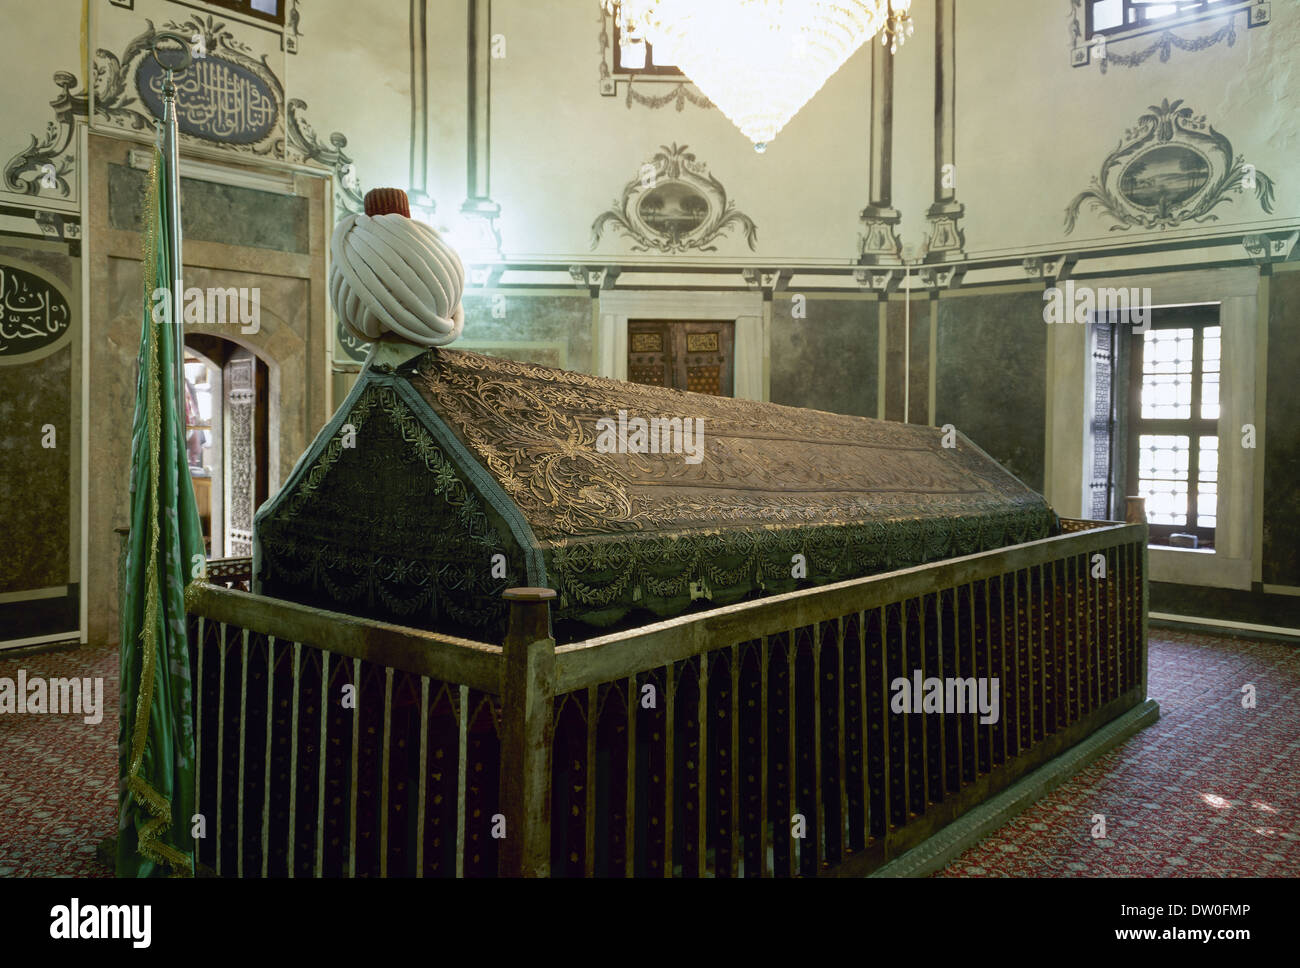 Tomb of Sultan Bayezid II or Bayezed-i-Veli (1447-1512). House of Osman.  Bayezid II Mosque. Istanbul. Turkey.